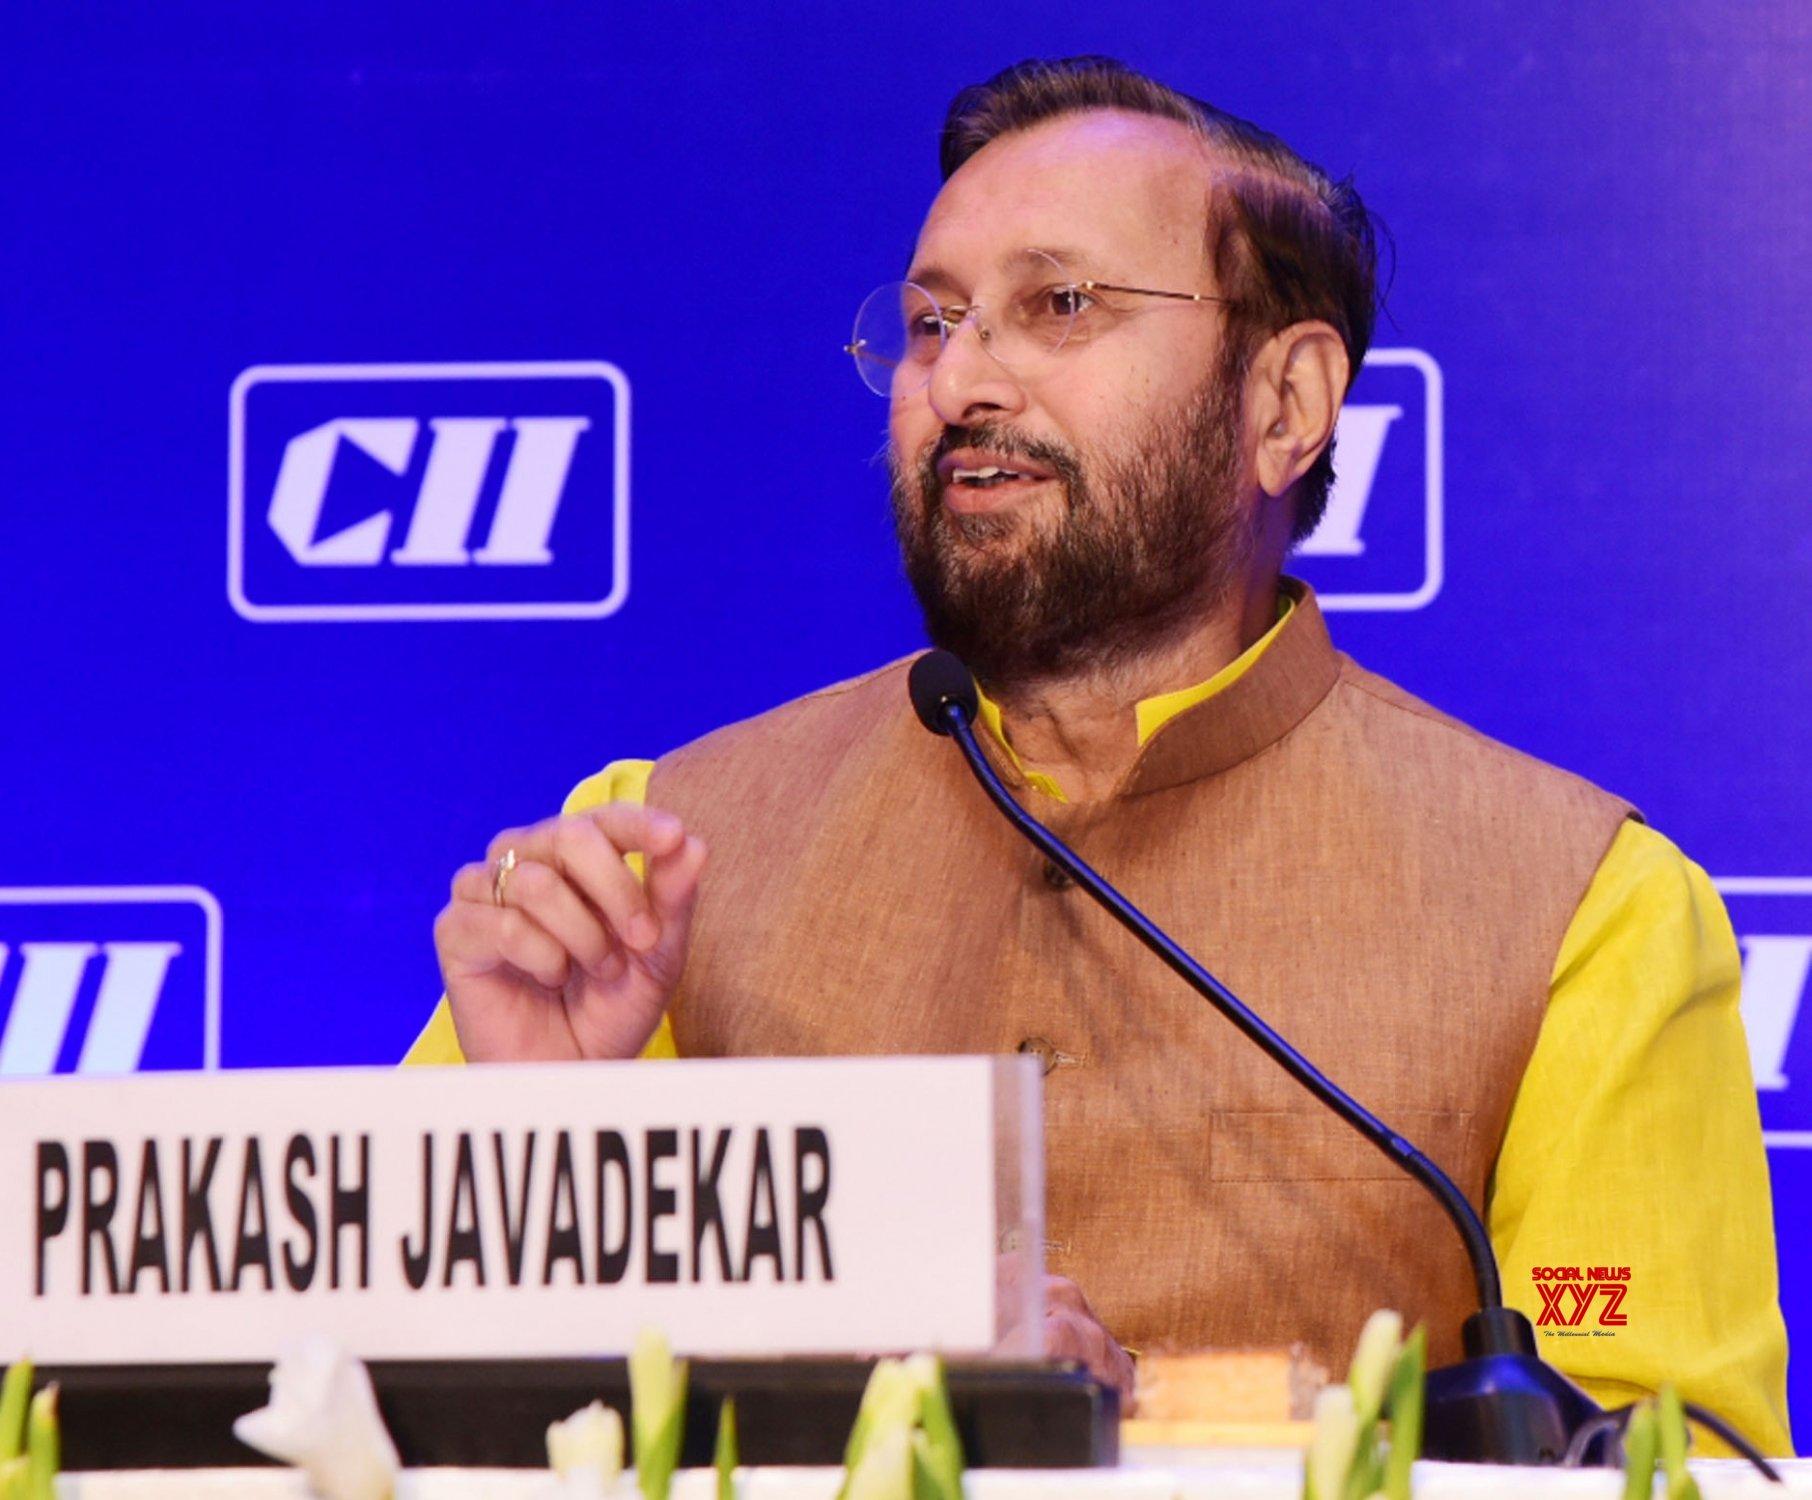 New Delhi: Prakash Javadekar at the National Council Meeting of CII #Gallery